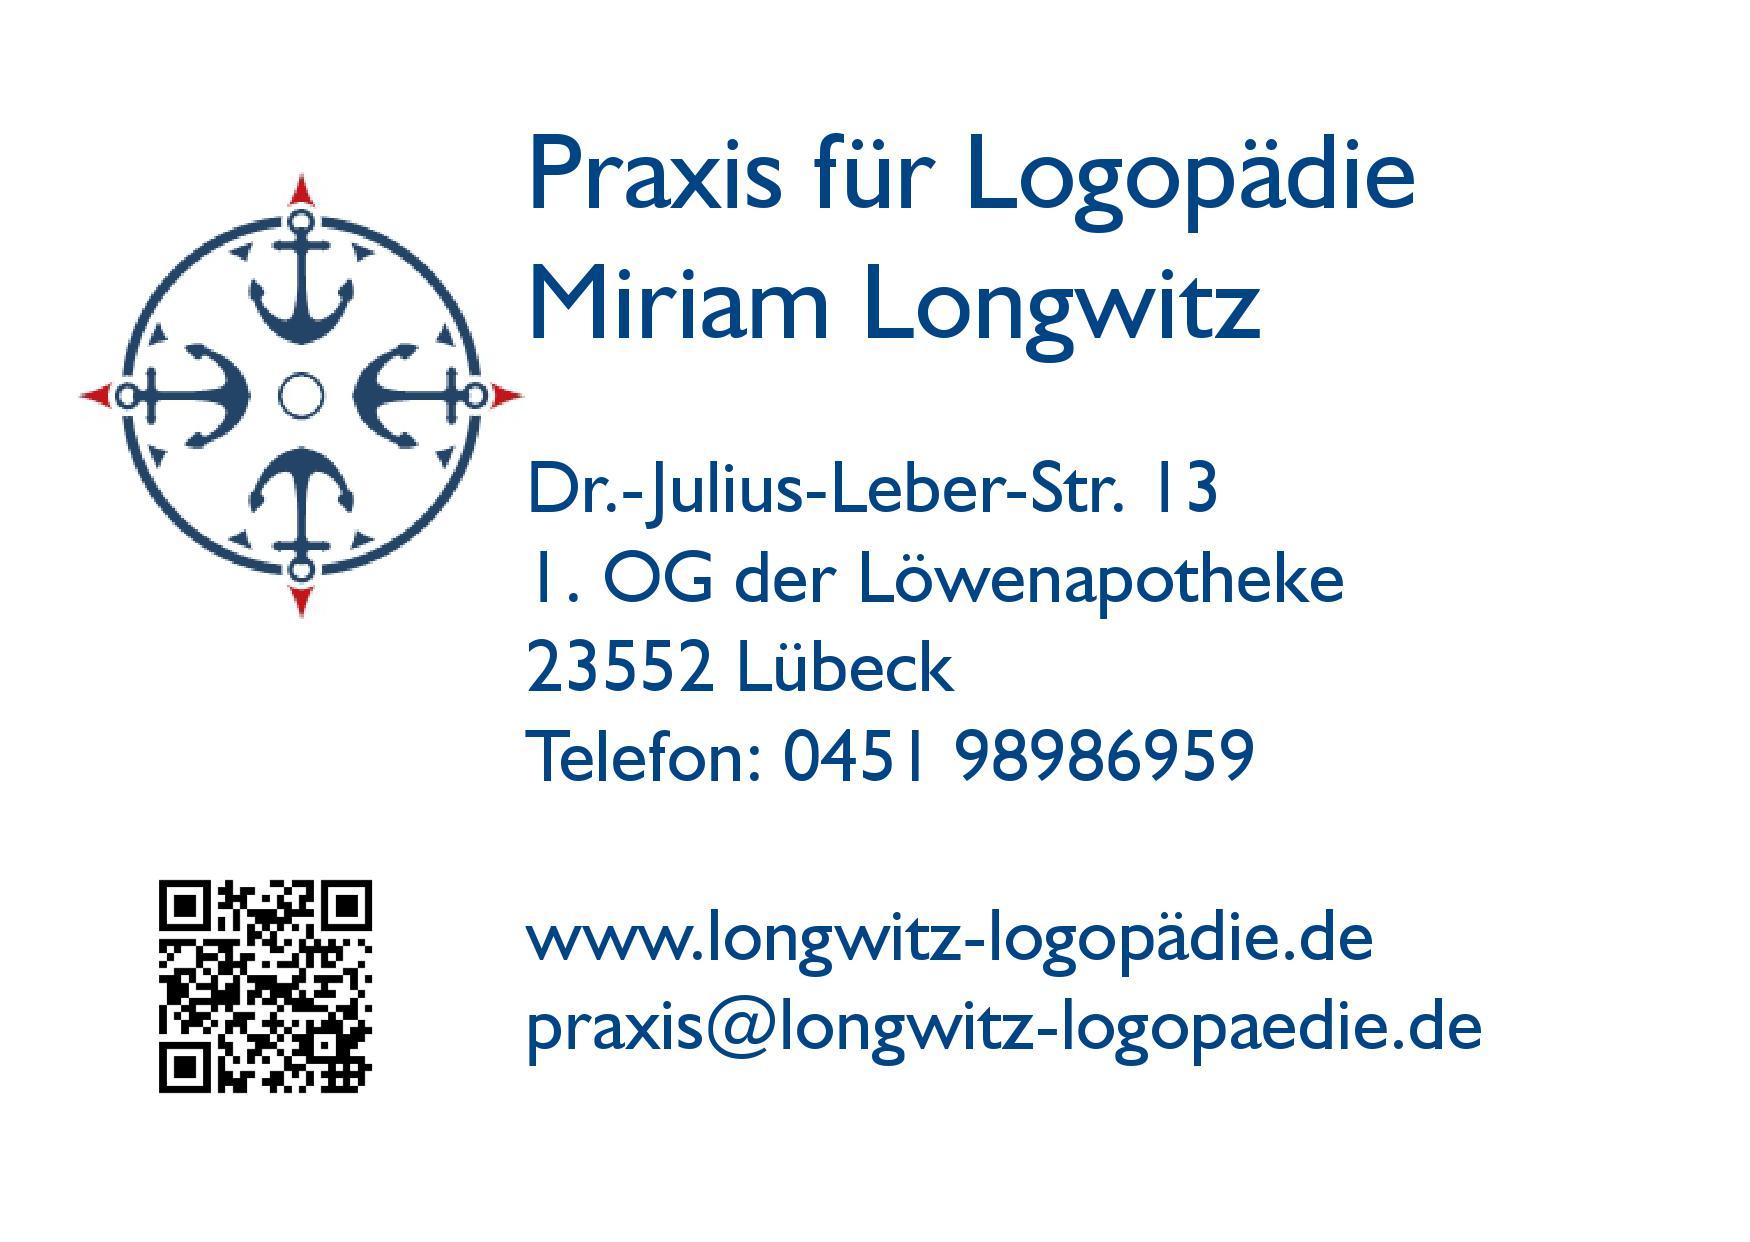 Longwitz Logopädie